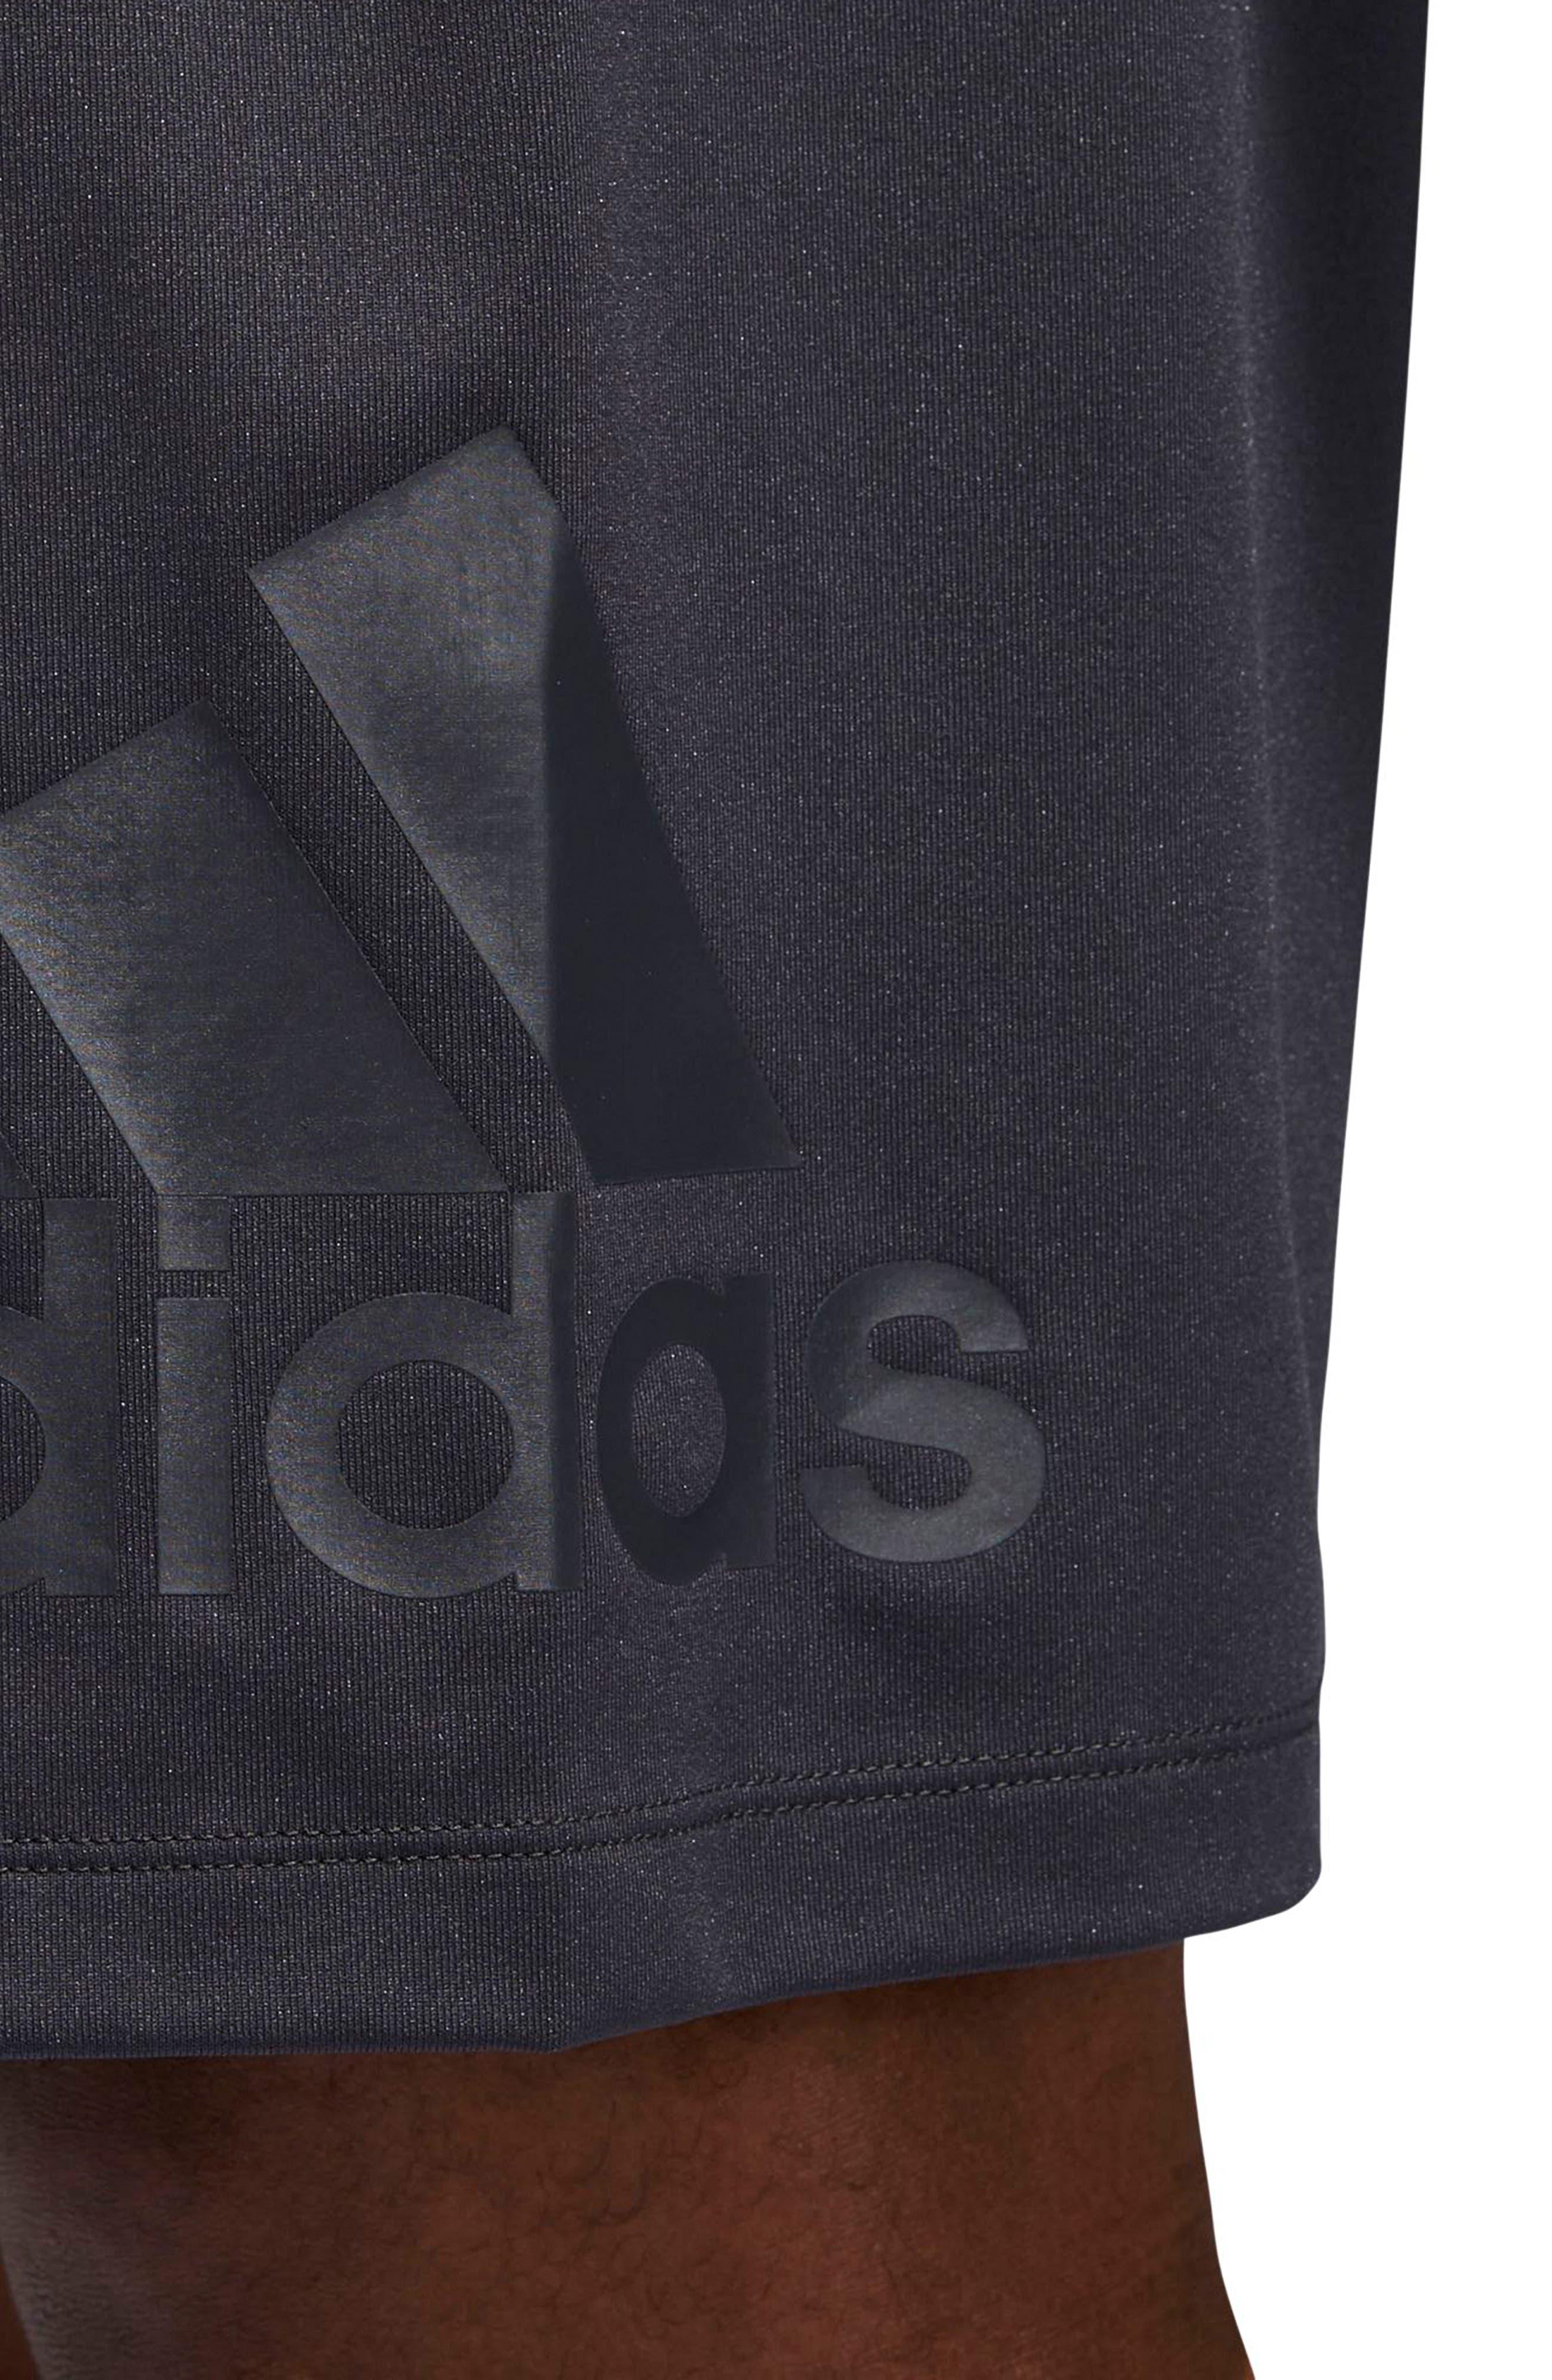 SB Hype Icon Shorts,                             Alternate thumbnail 7, color,                             CARBON/ BLACK